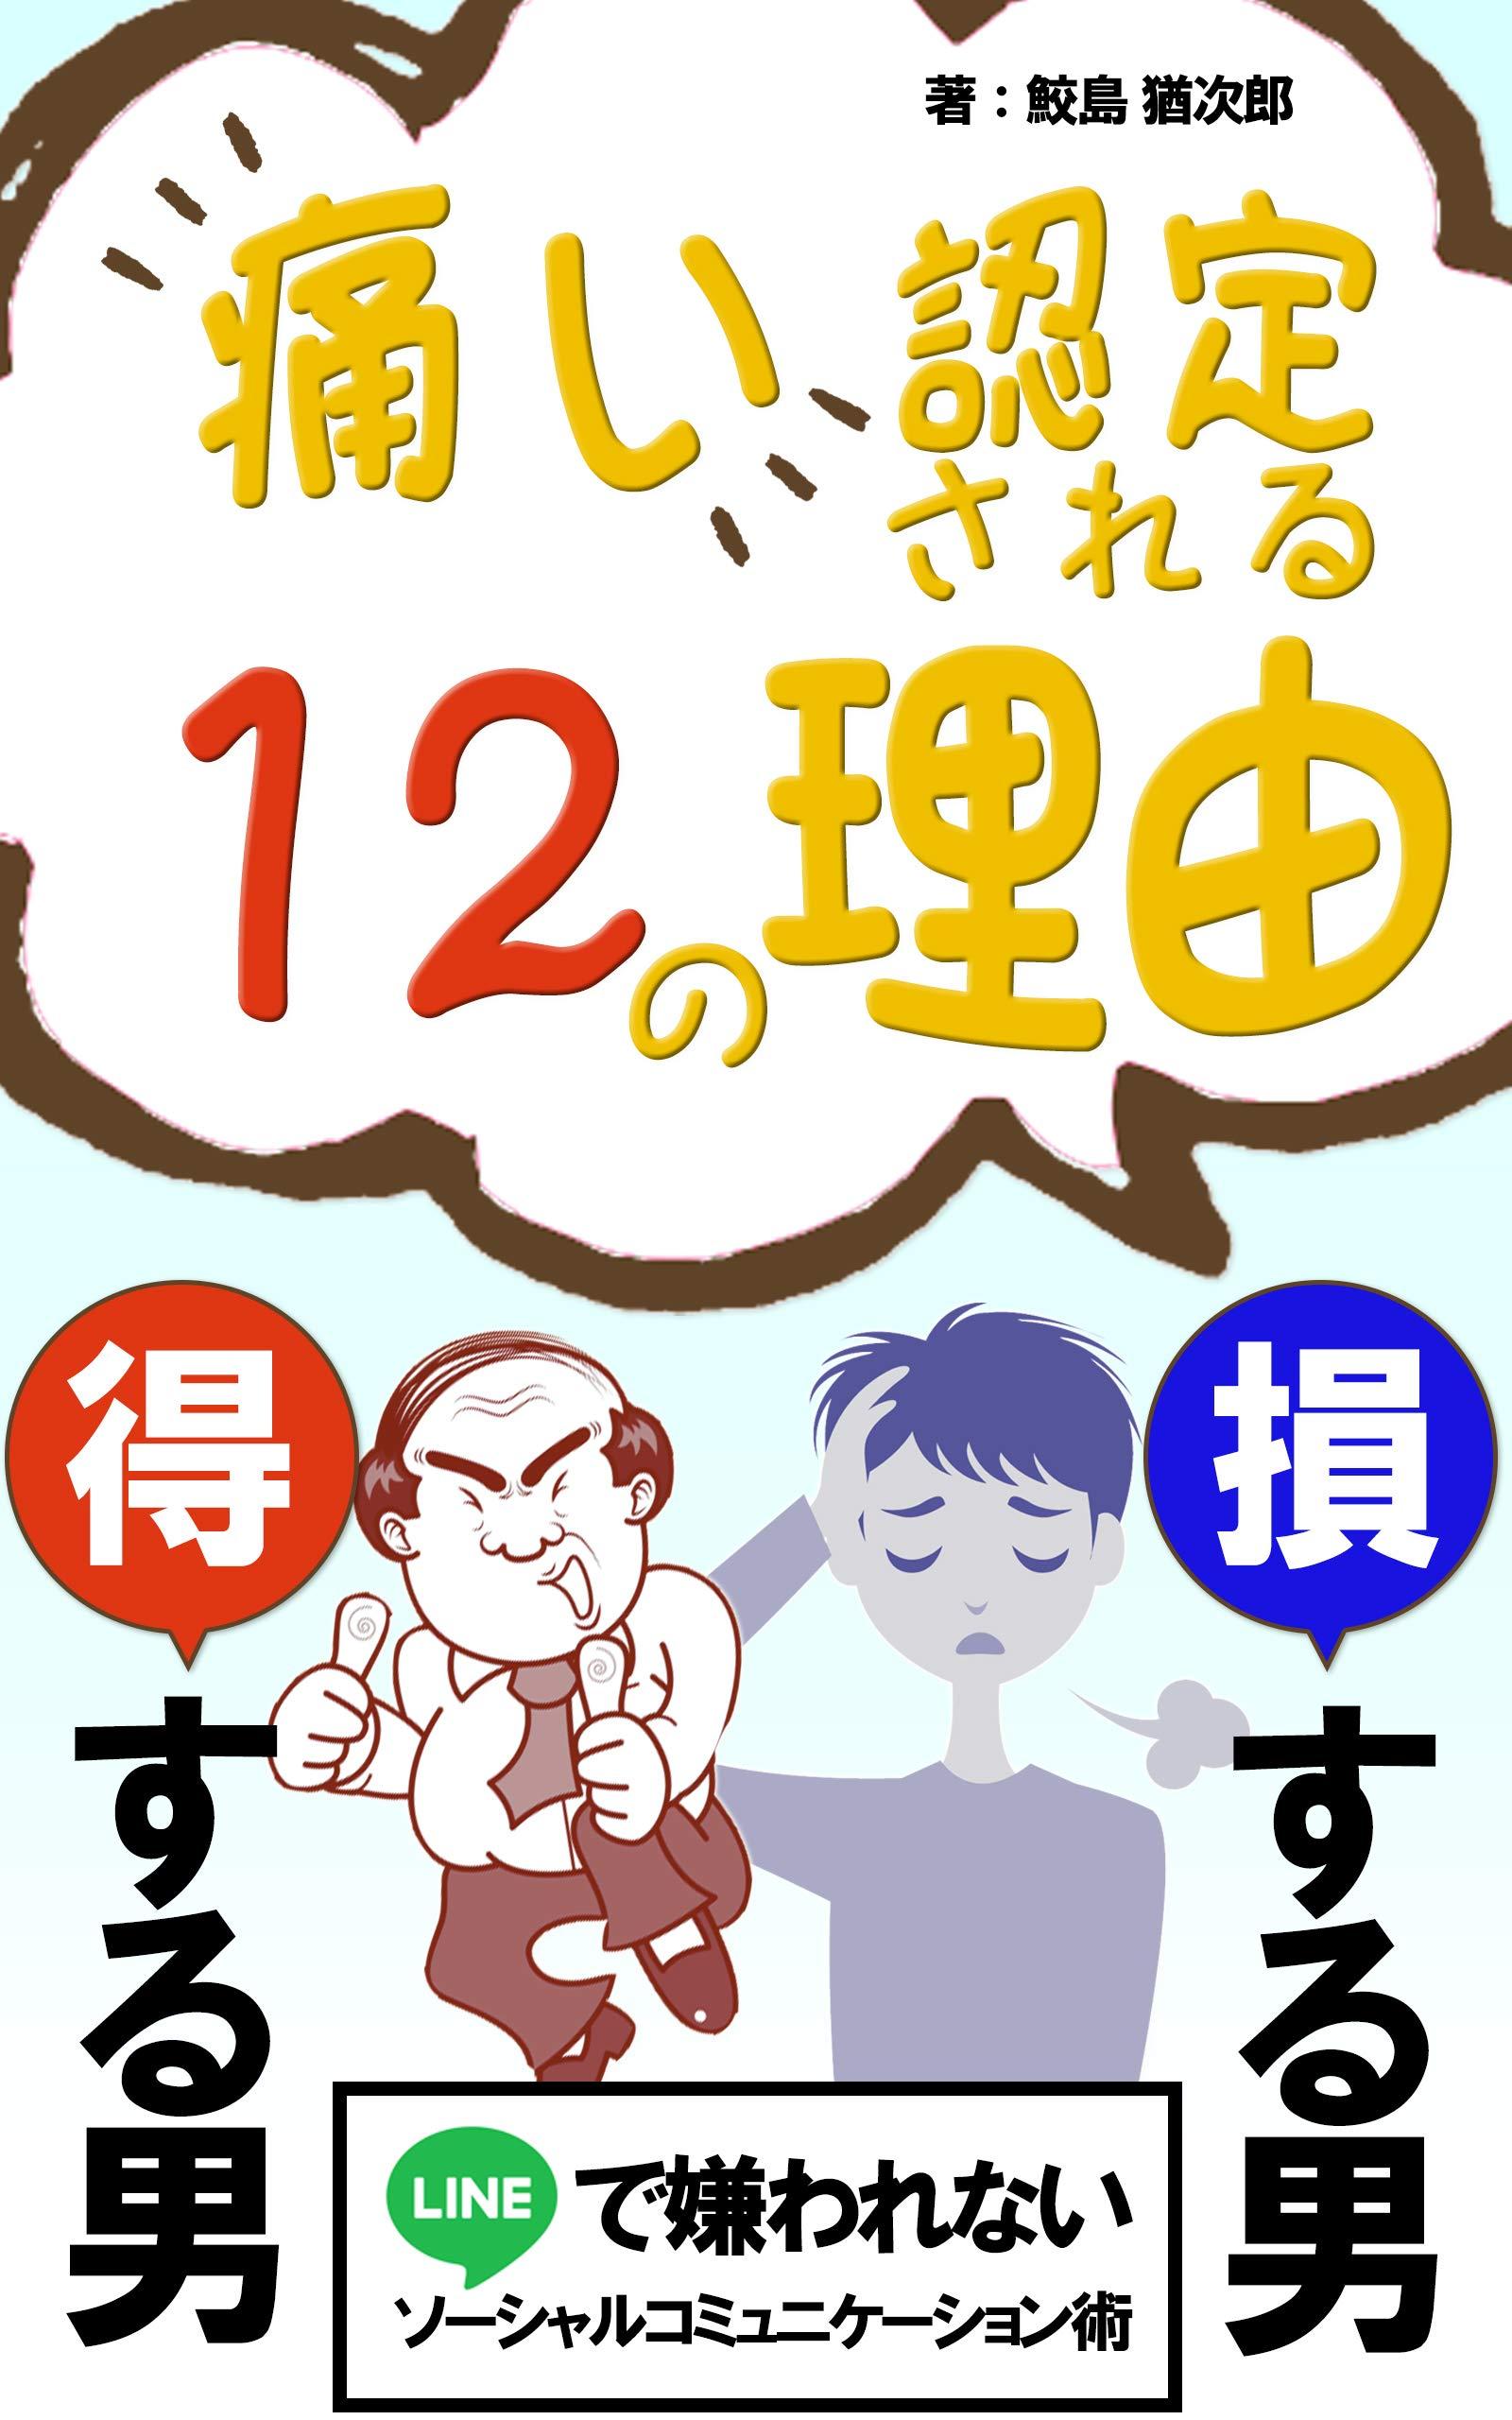 itaininnteisarerujyuuninoriyuu: linedesonsuruotokototokusuruotoko (Japanese Edition)